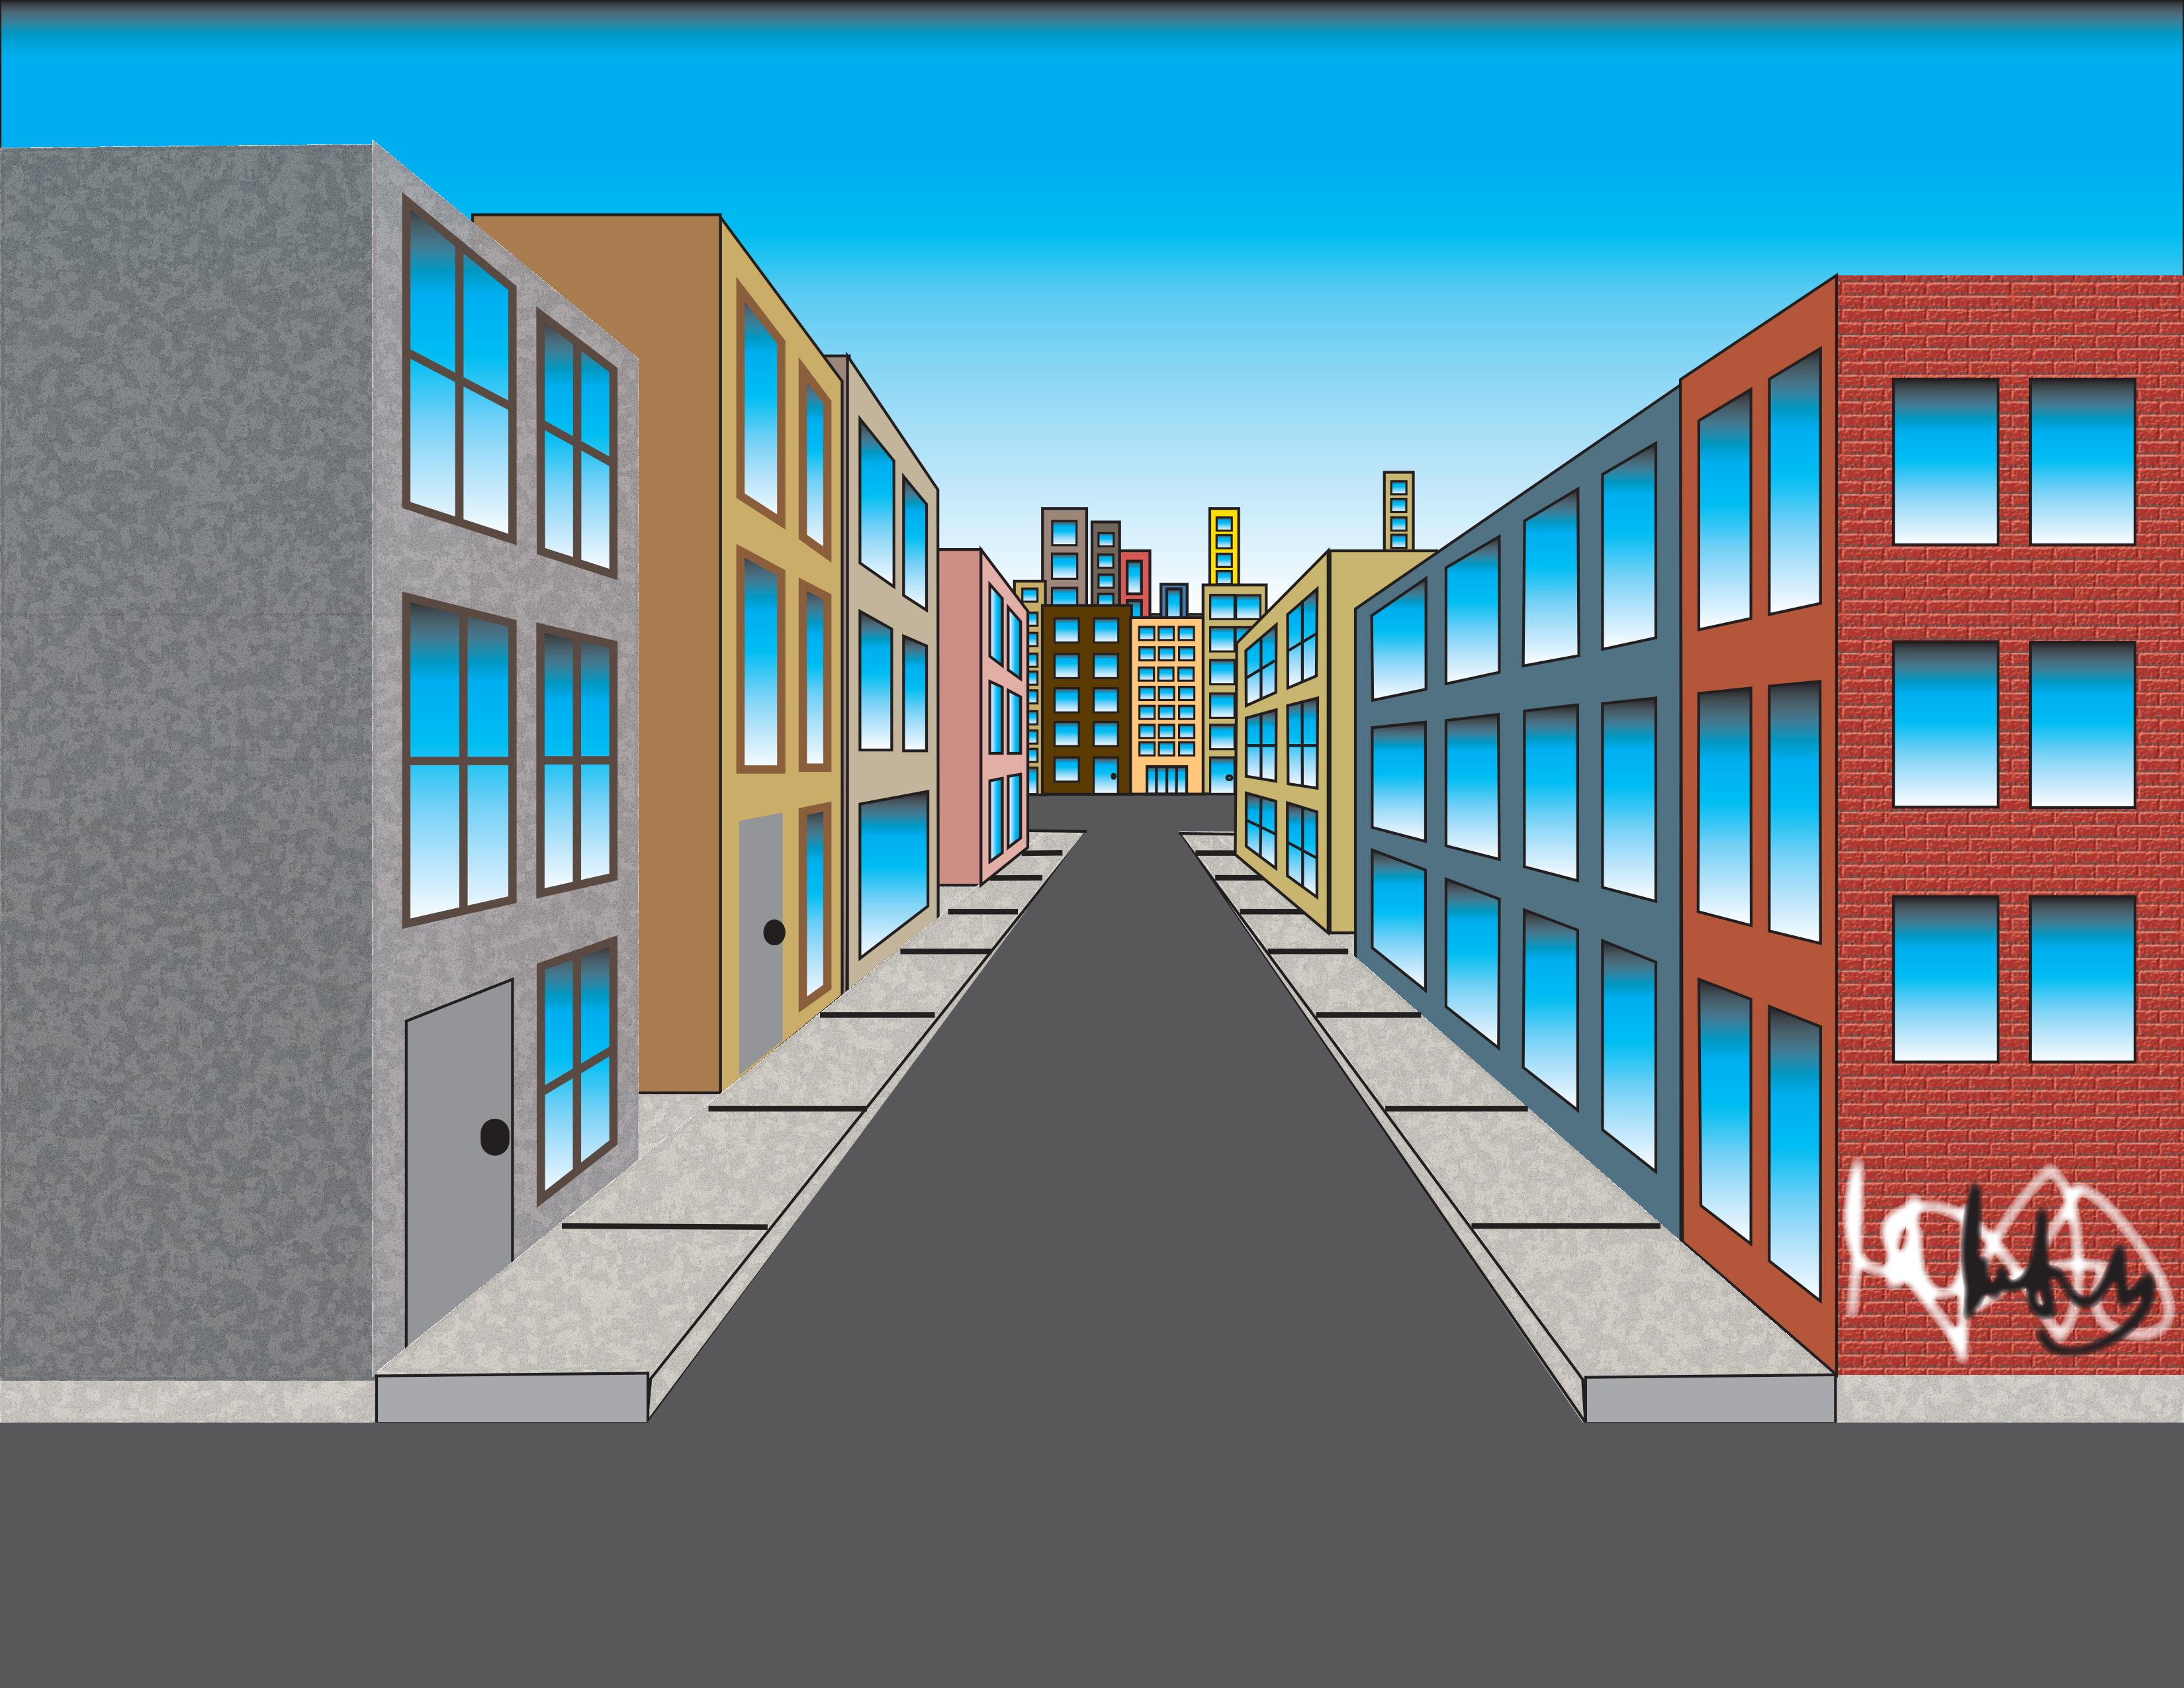 stuart davis  u2013 perspective city